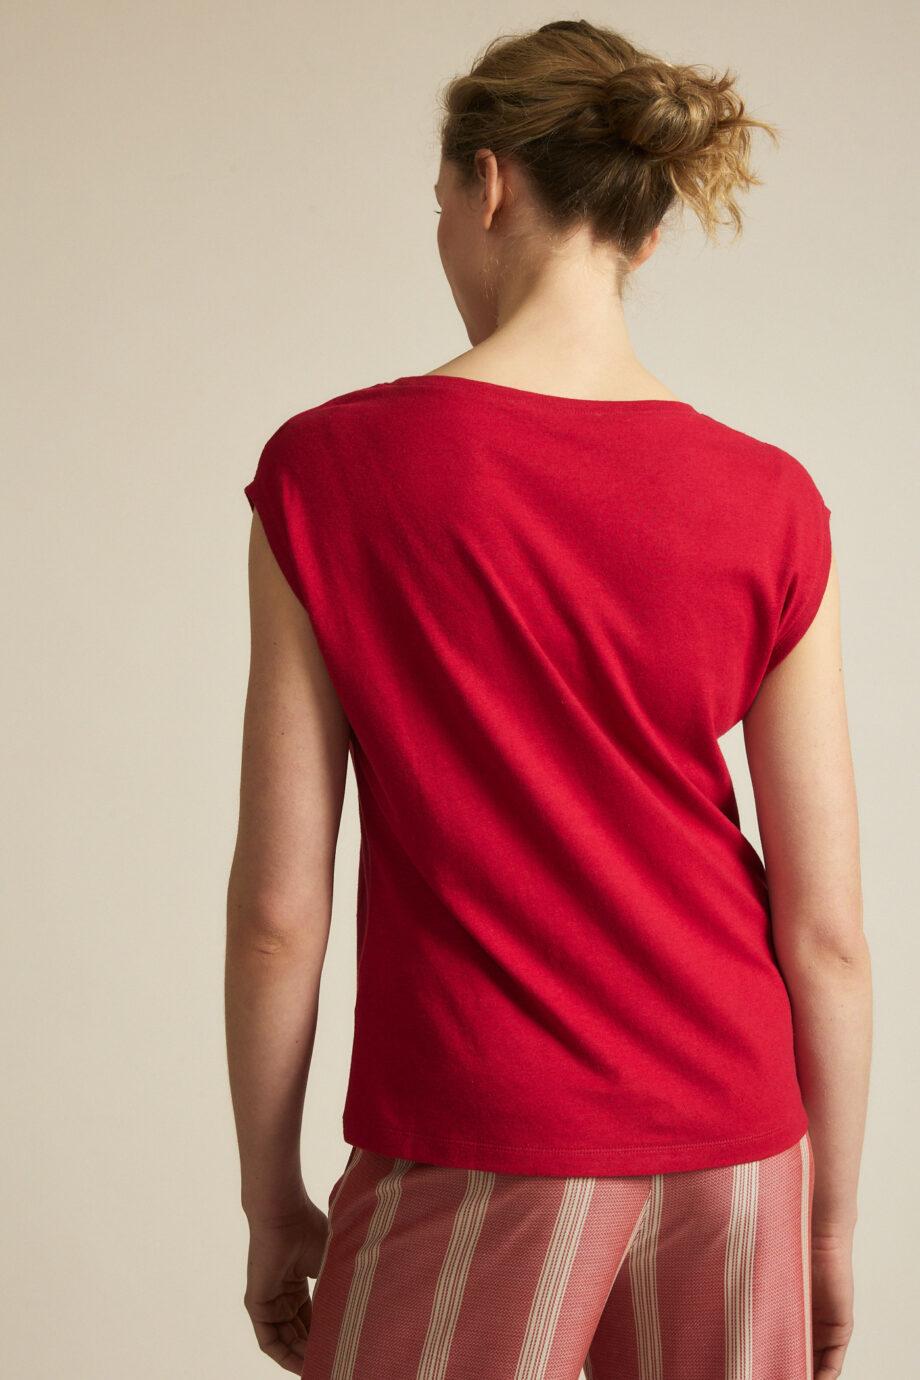 Lanius_Shirt doorlopende mouw_rood chili pepper_achter